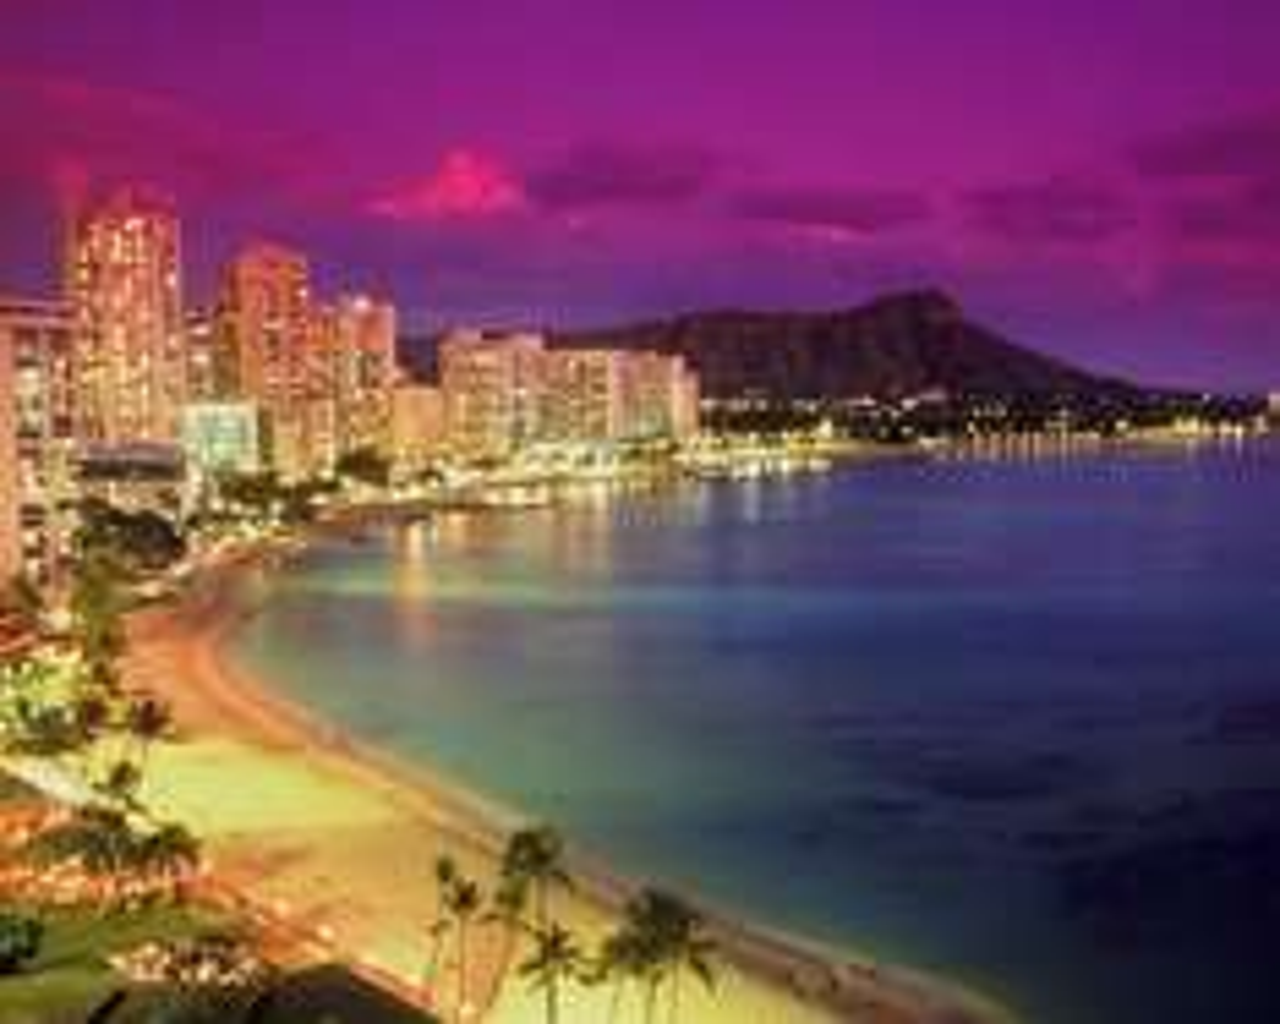 Hin- und Rückflüge von Amsterdam oder Frankreich (Paris, Lyon, Nizza oder Straßburg) nach Hawaii (Honolulu, Lihue, Kahului, Kona) [Oktober - März]